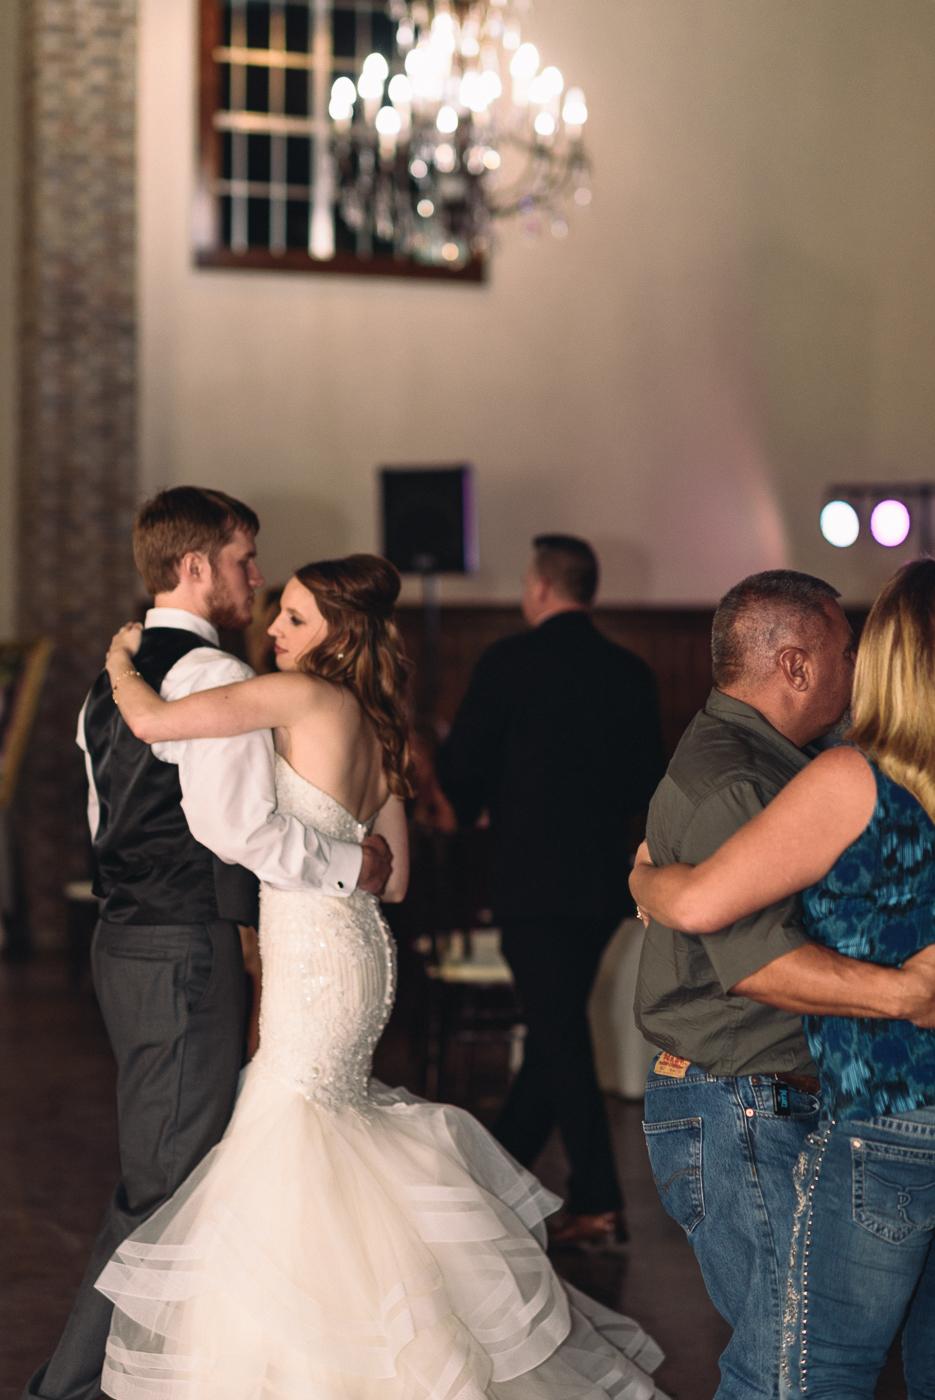 wedding reception bride and groom dancing slow dance mermaid gown